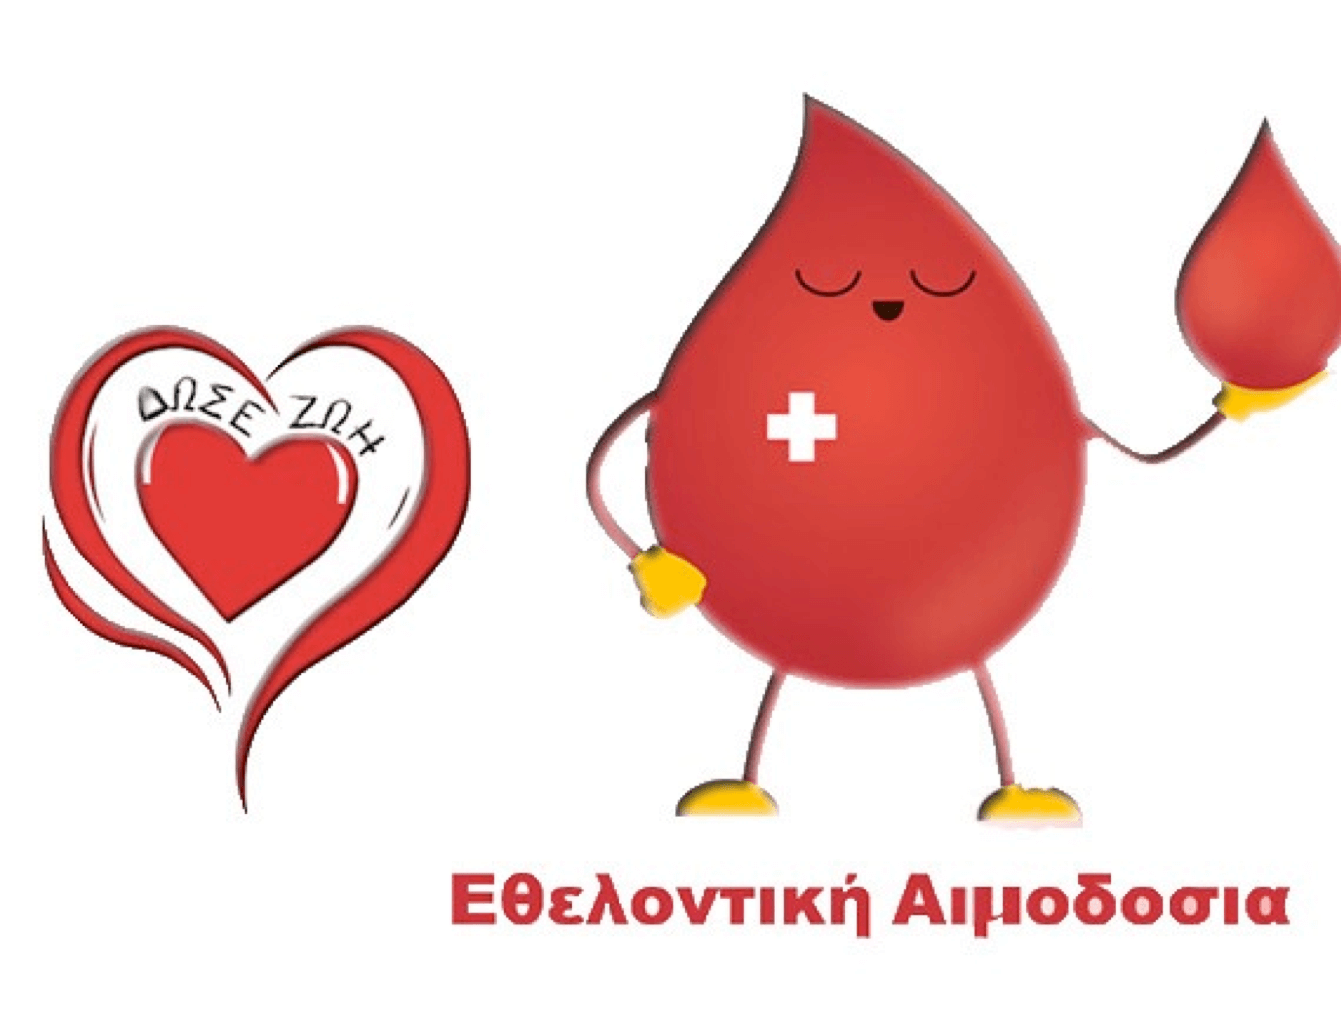 dosezoi.gr διοργανώνει εθελοντική αιμοδοσία, μία προσφορά αγάπης που σώζει ζωές| YouBeHero